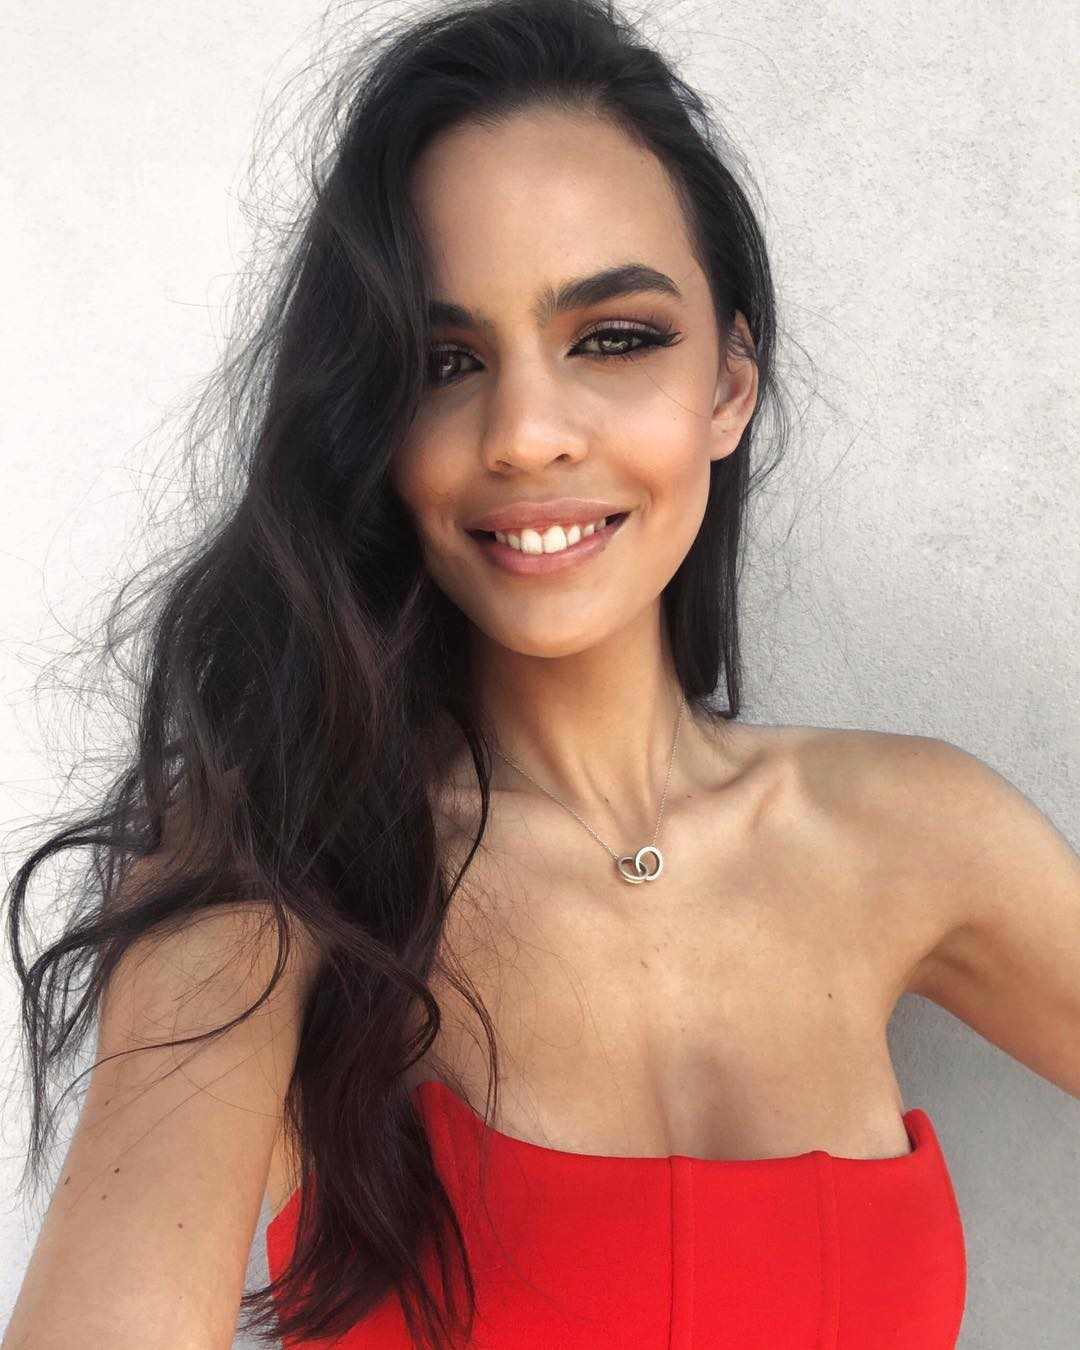 candidatas a miss world australia 2018. final: 31 agosto. - Página 6 Mmxfdfhd